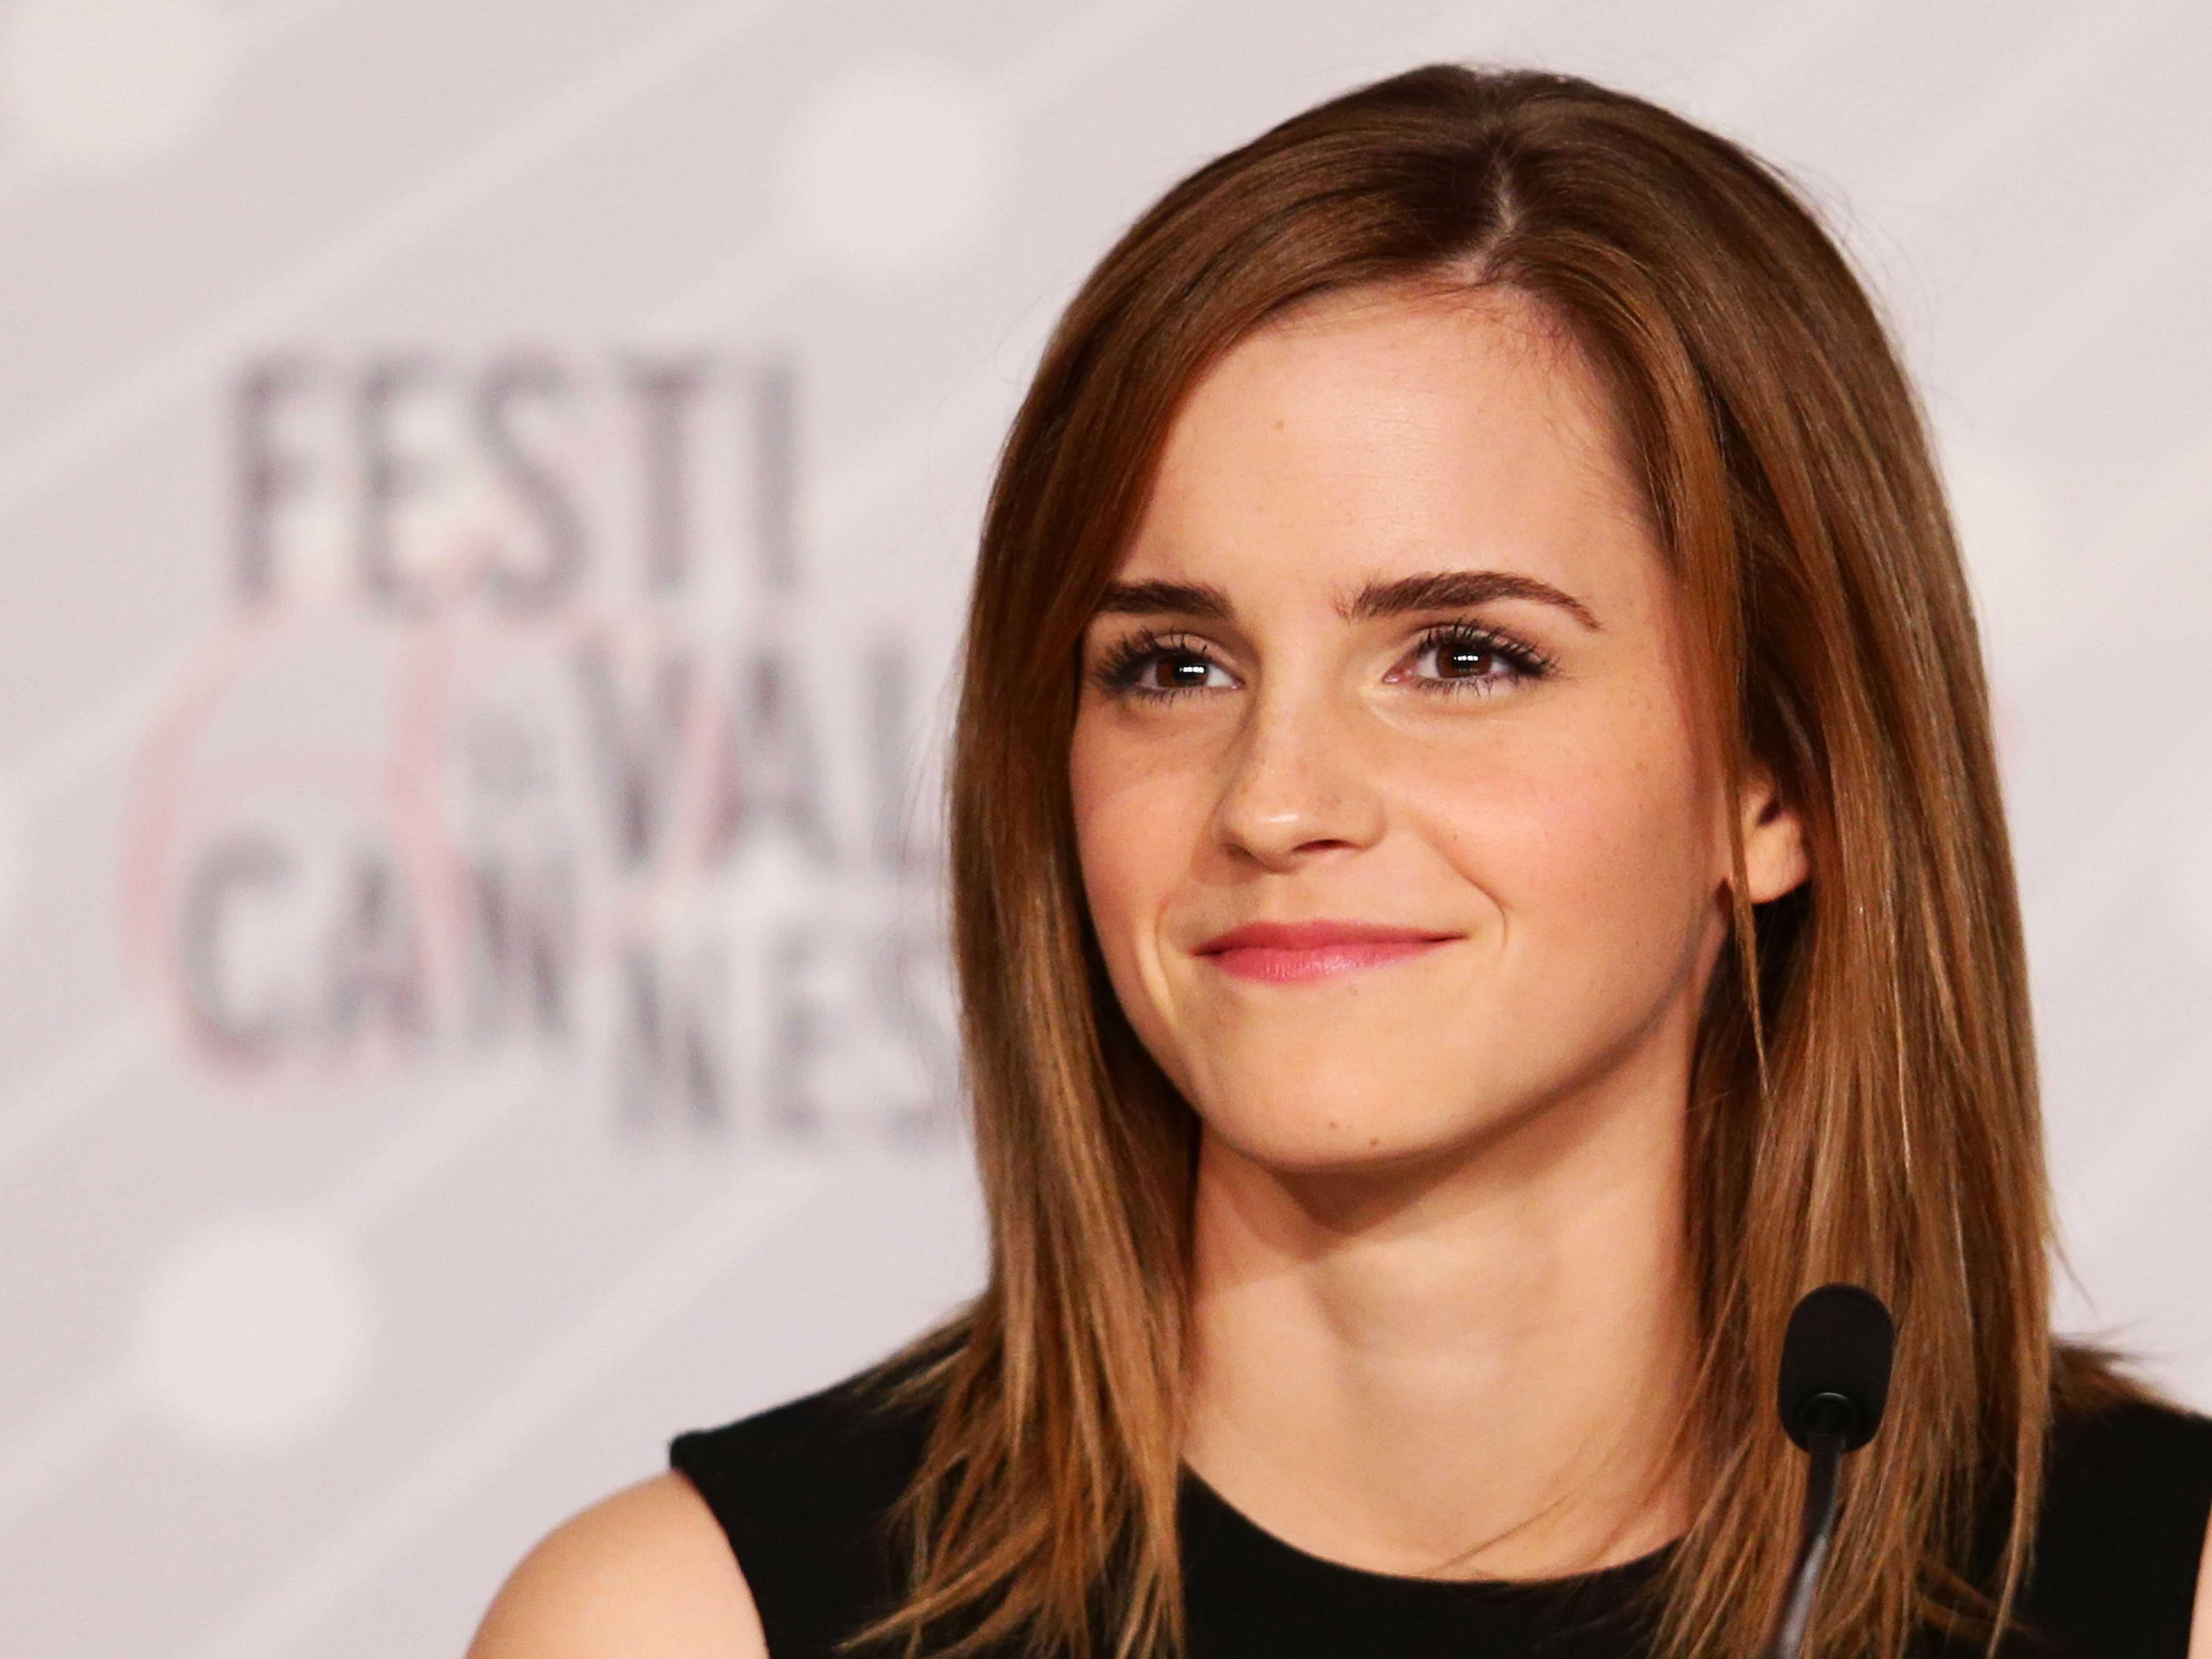 Emma Watson Backgrounds, Compatible - PC, Mobile, Gadgets| 4602x3451 px